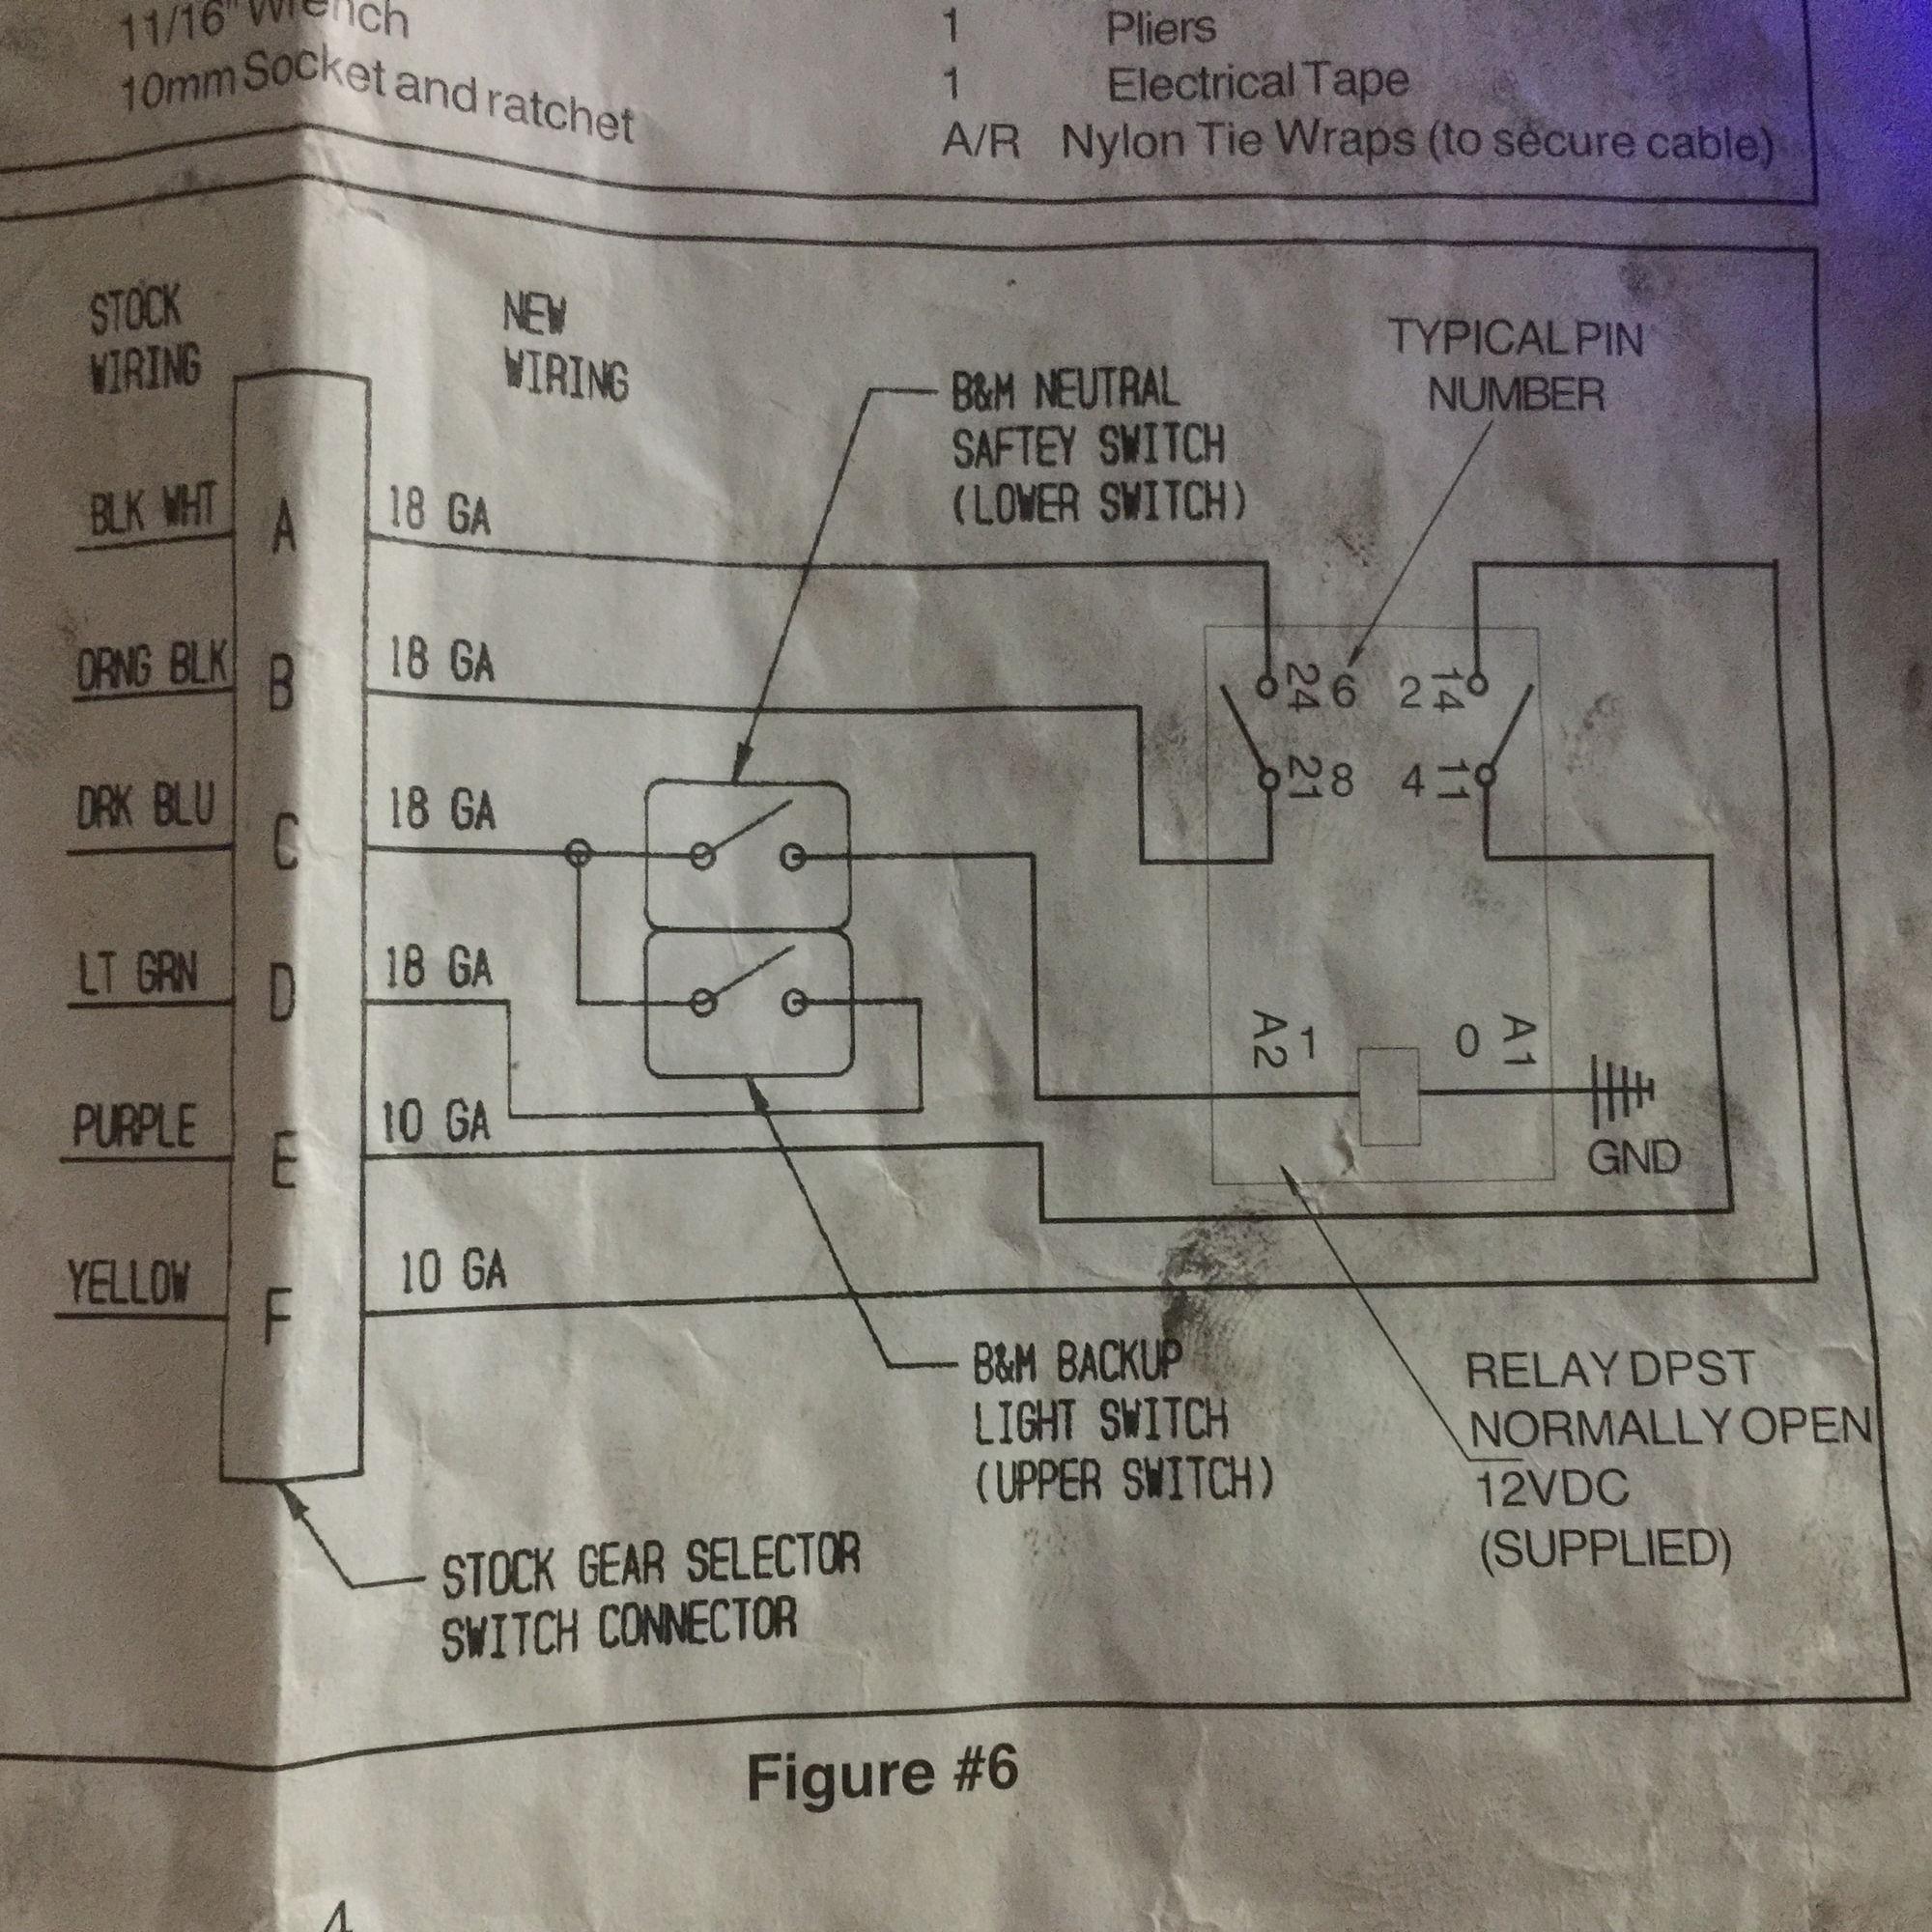 1993 4l80e transmission wiring diagram - dolgular, Wiring diagram